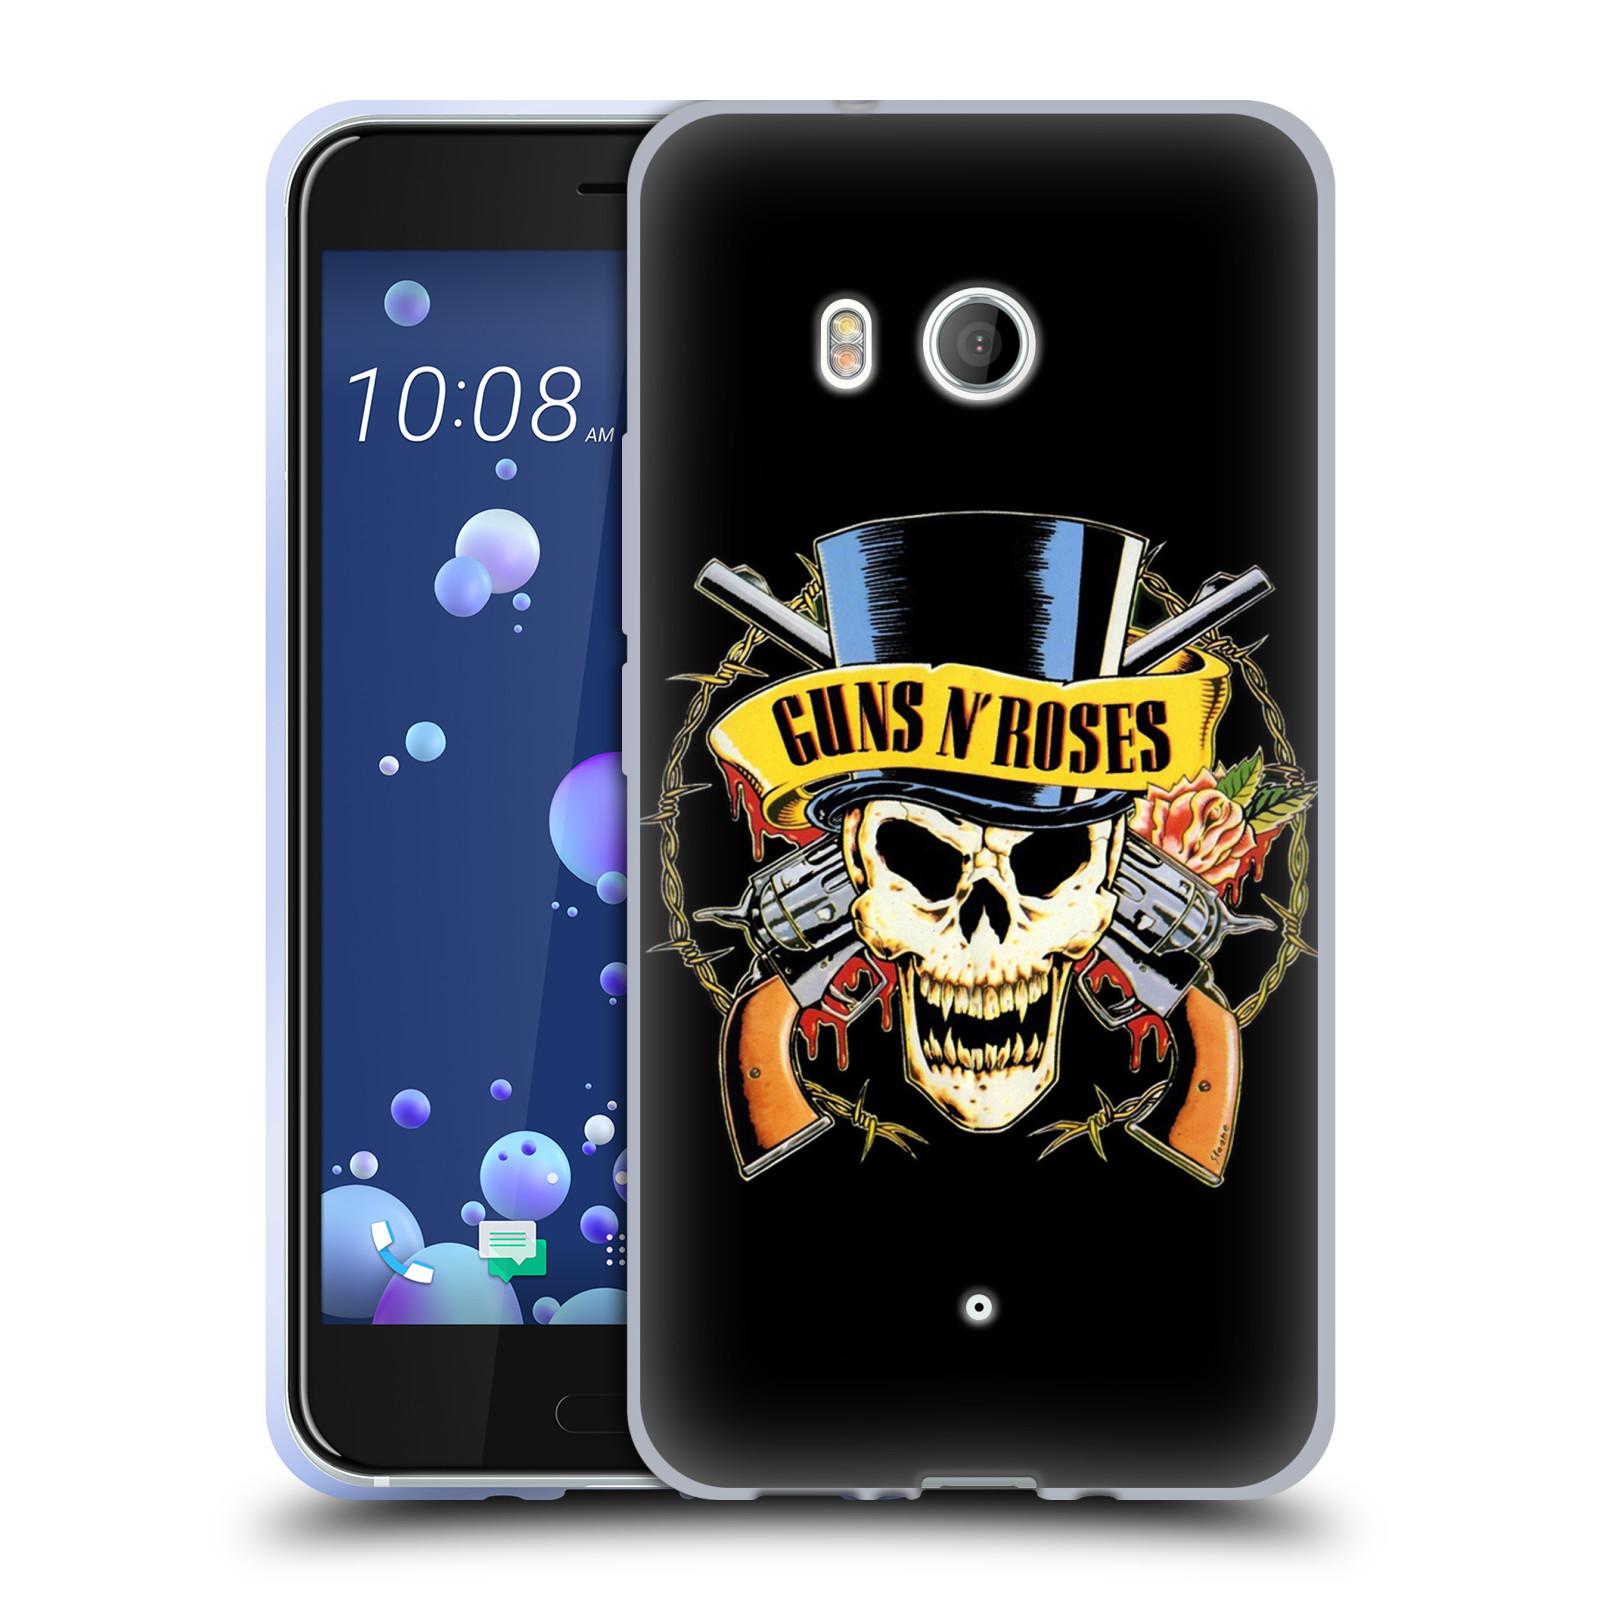 Silikonové pouzdro na mobil HTC U11 - Head Case - Guns N' Roses - Lebka